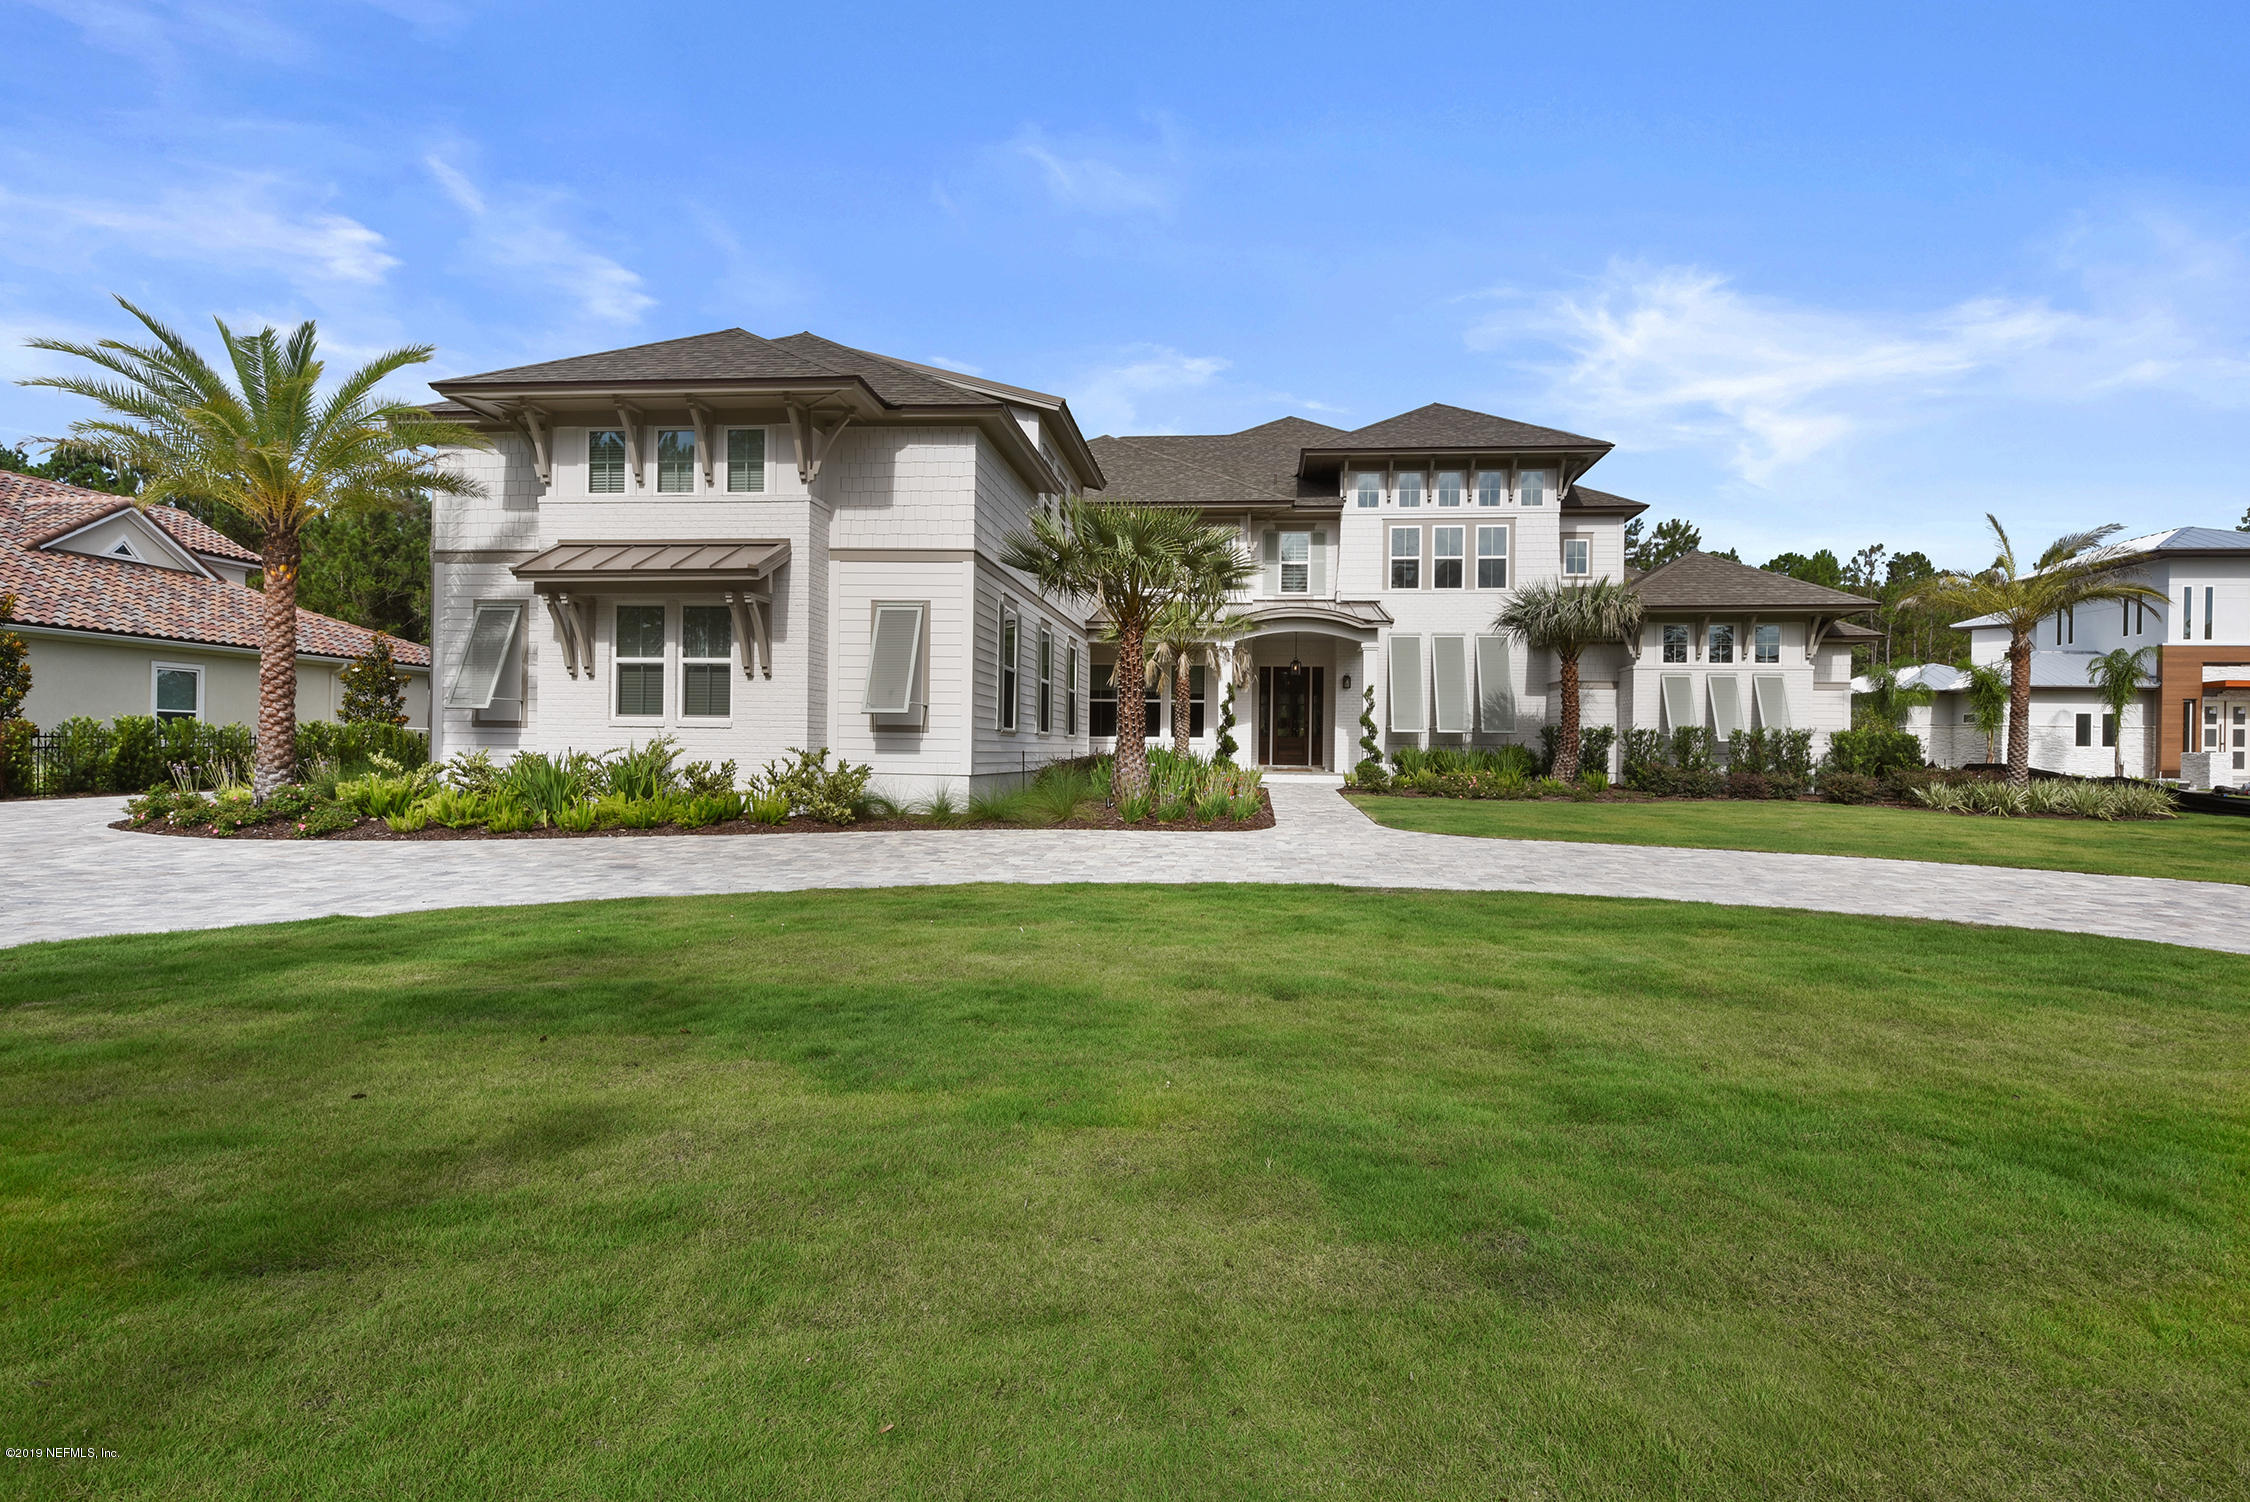 4486 HUNTERSTON, JACKSONVILLE, FLORIDA 32224, 5 Bedrooms Bedrooms, ,6 BathroomsBathrooms,Residential - single family,For sale,HUNTERSTON,1011799